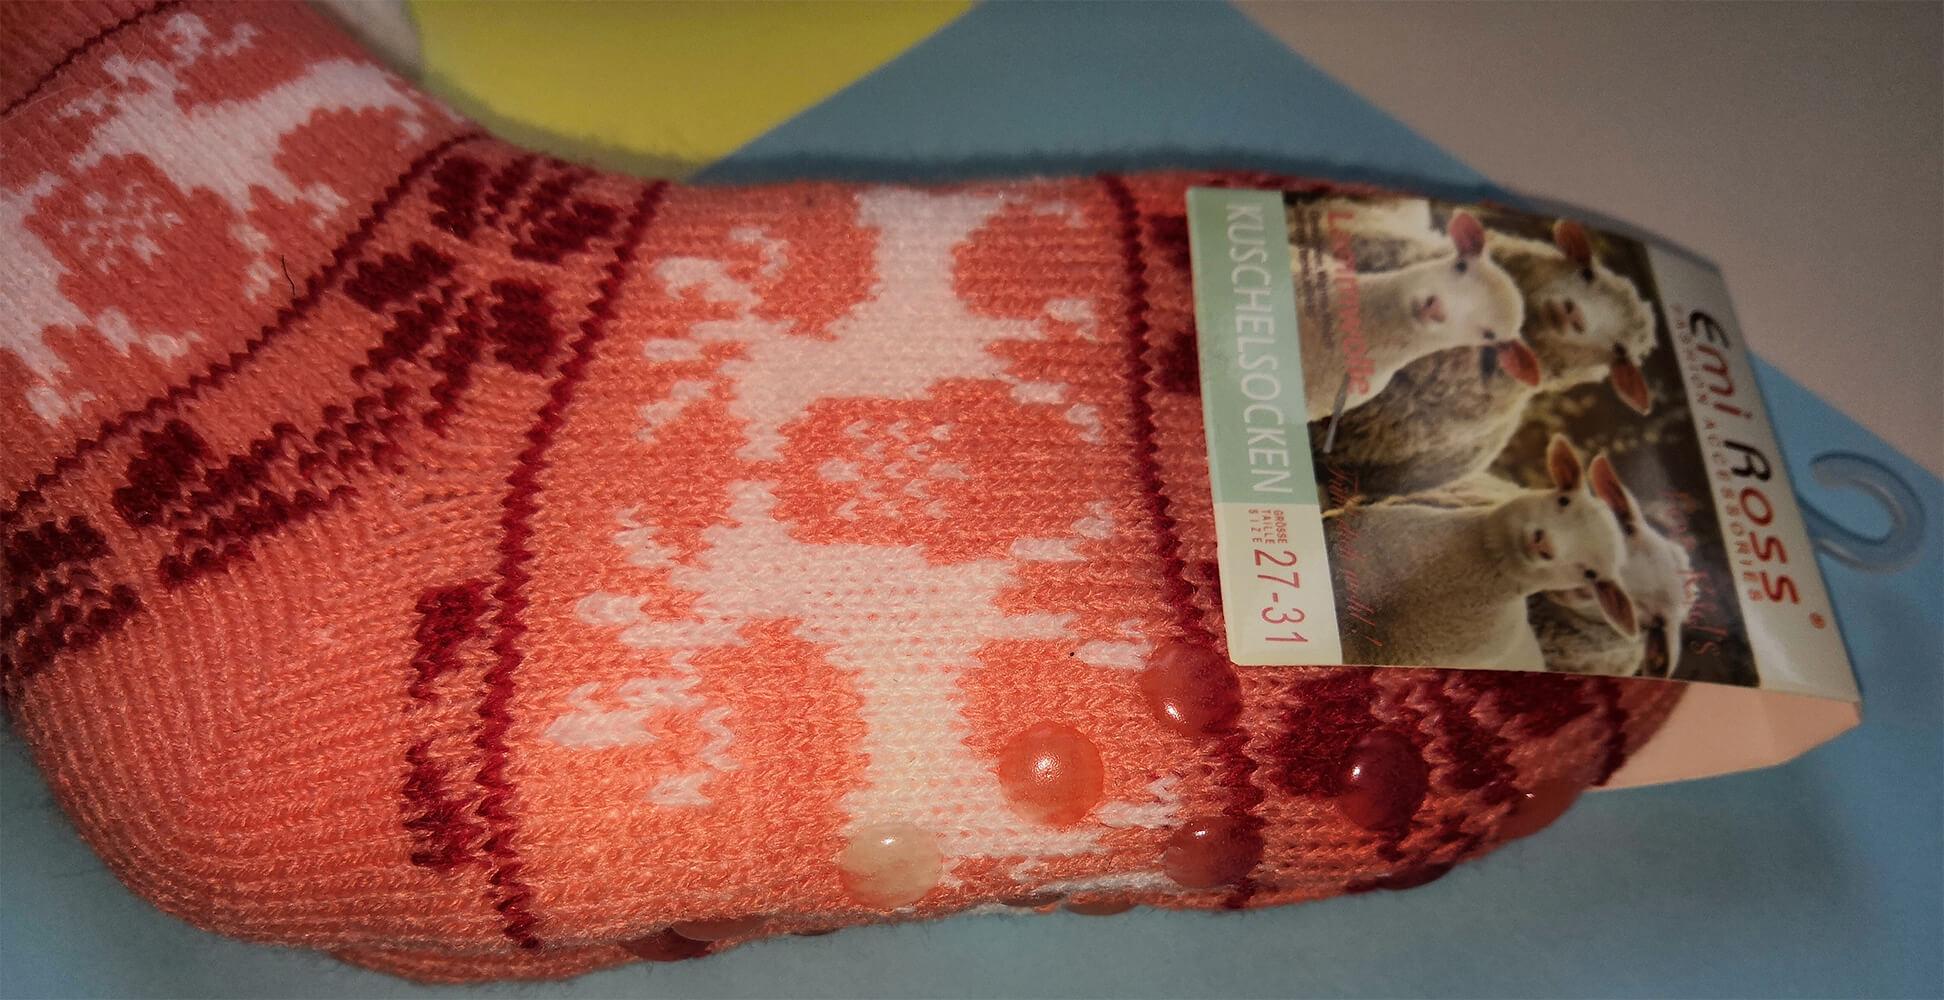 Детские носки-тапочки Emi Ross EJ-6209-c кораллового цвета. Фото 3